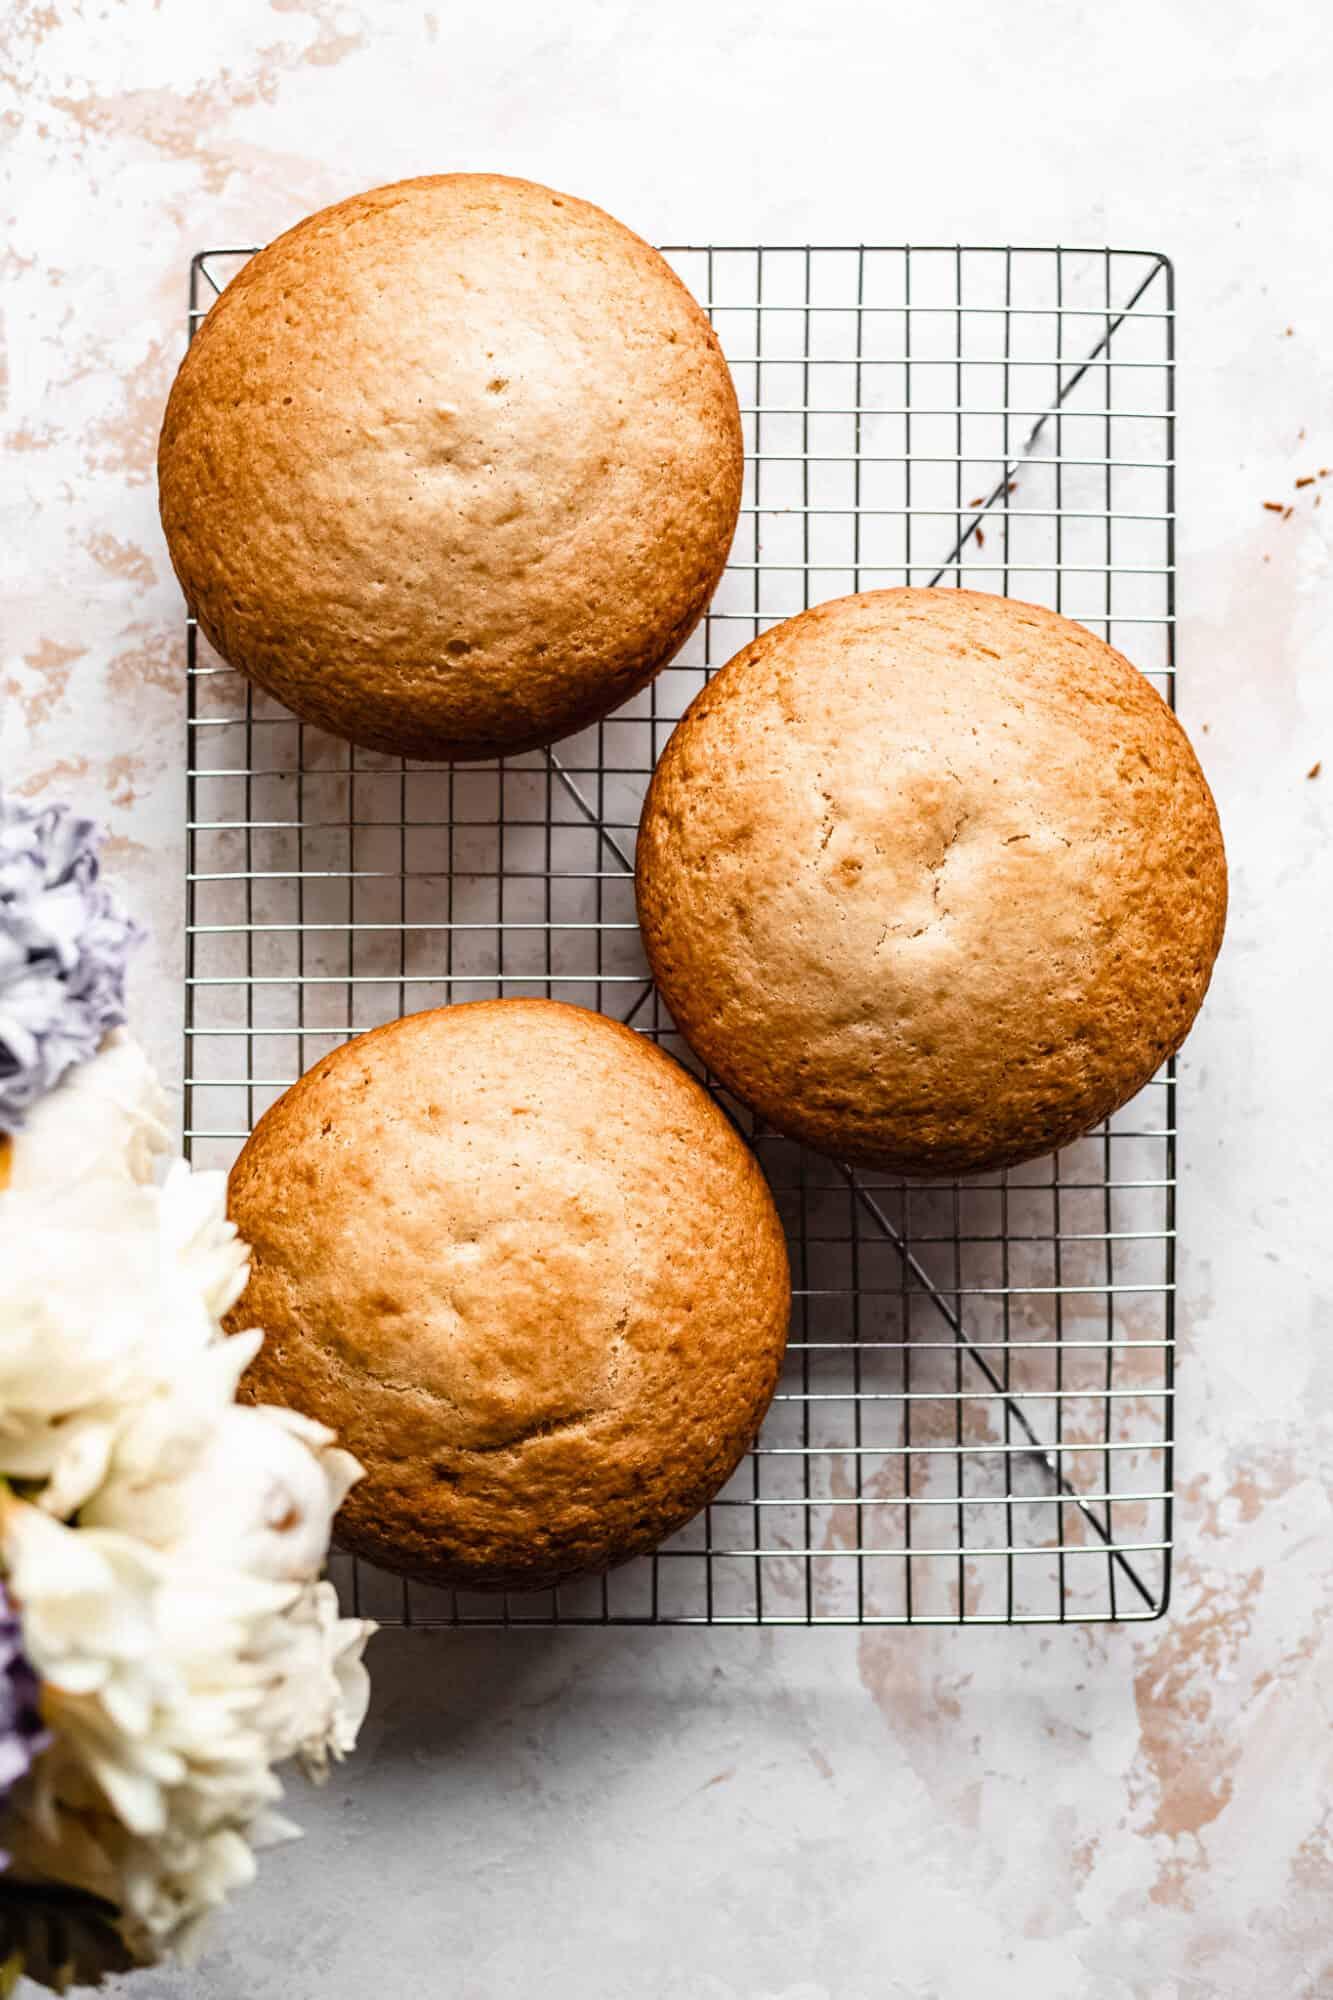 gluten free vegan vanilla cakes on drying rack